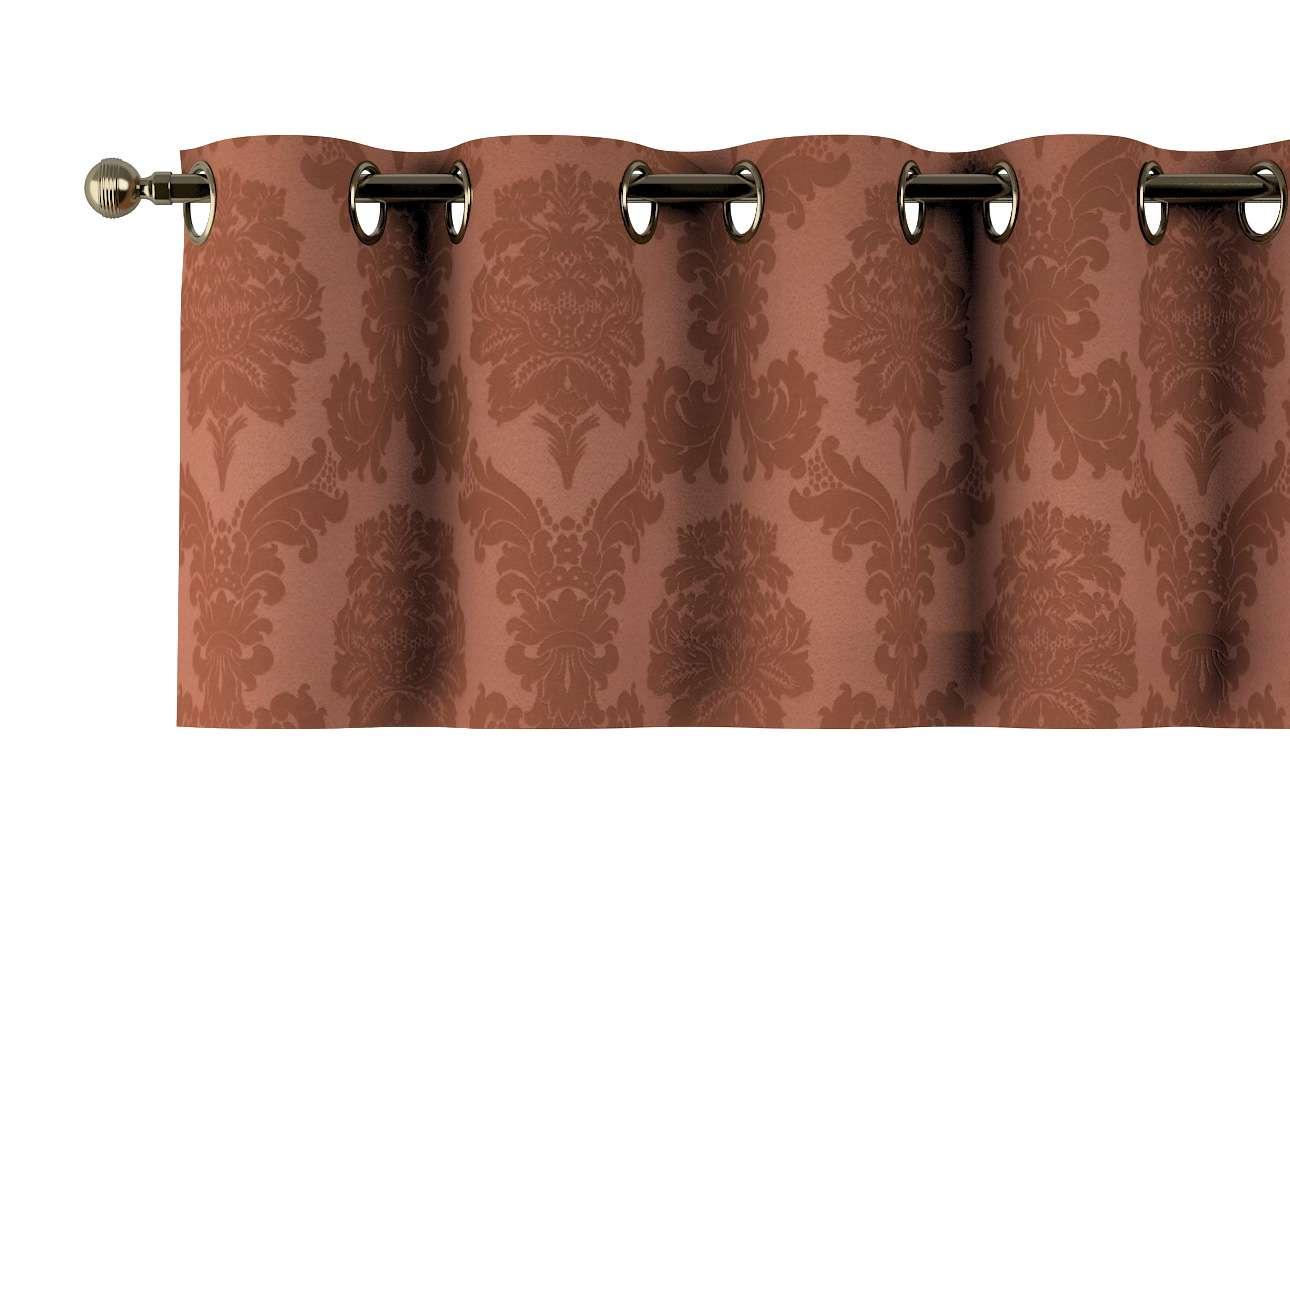 Krátky záves na kolieskach V kolekcii Damasco, tkanina: 613-88